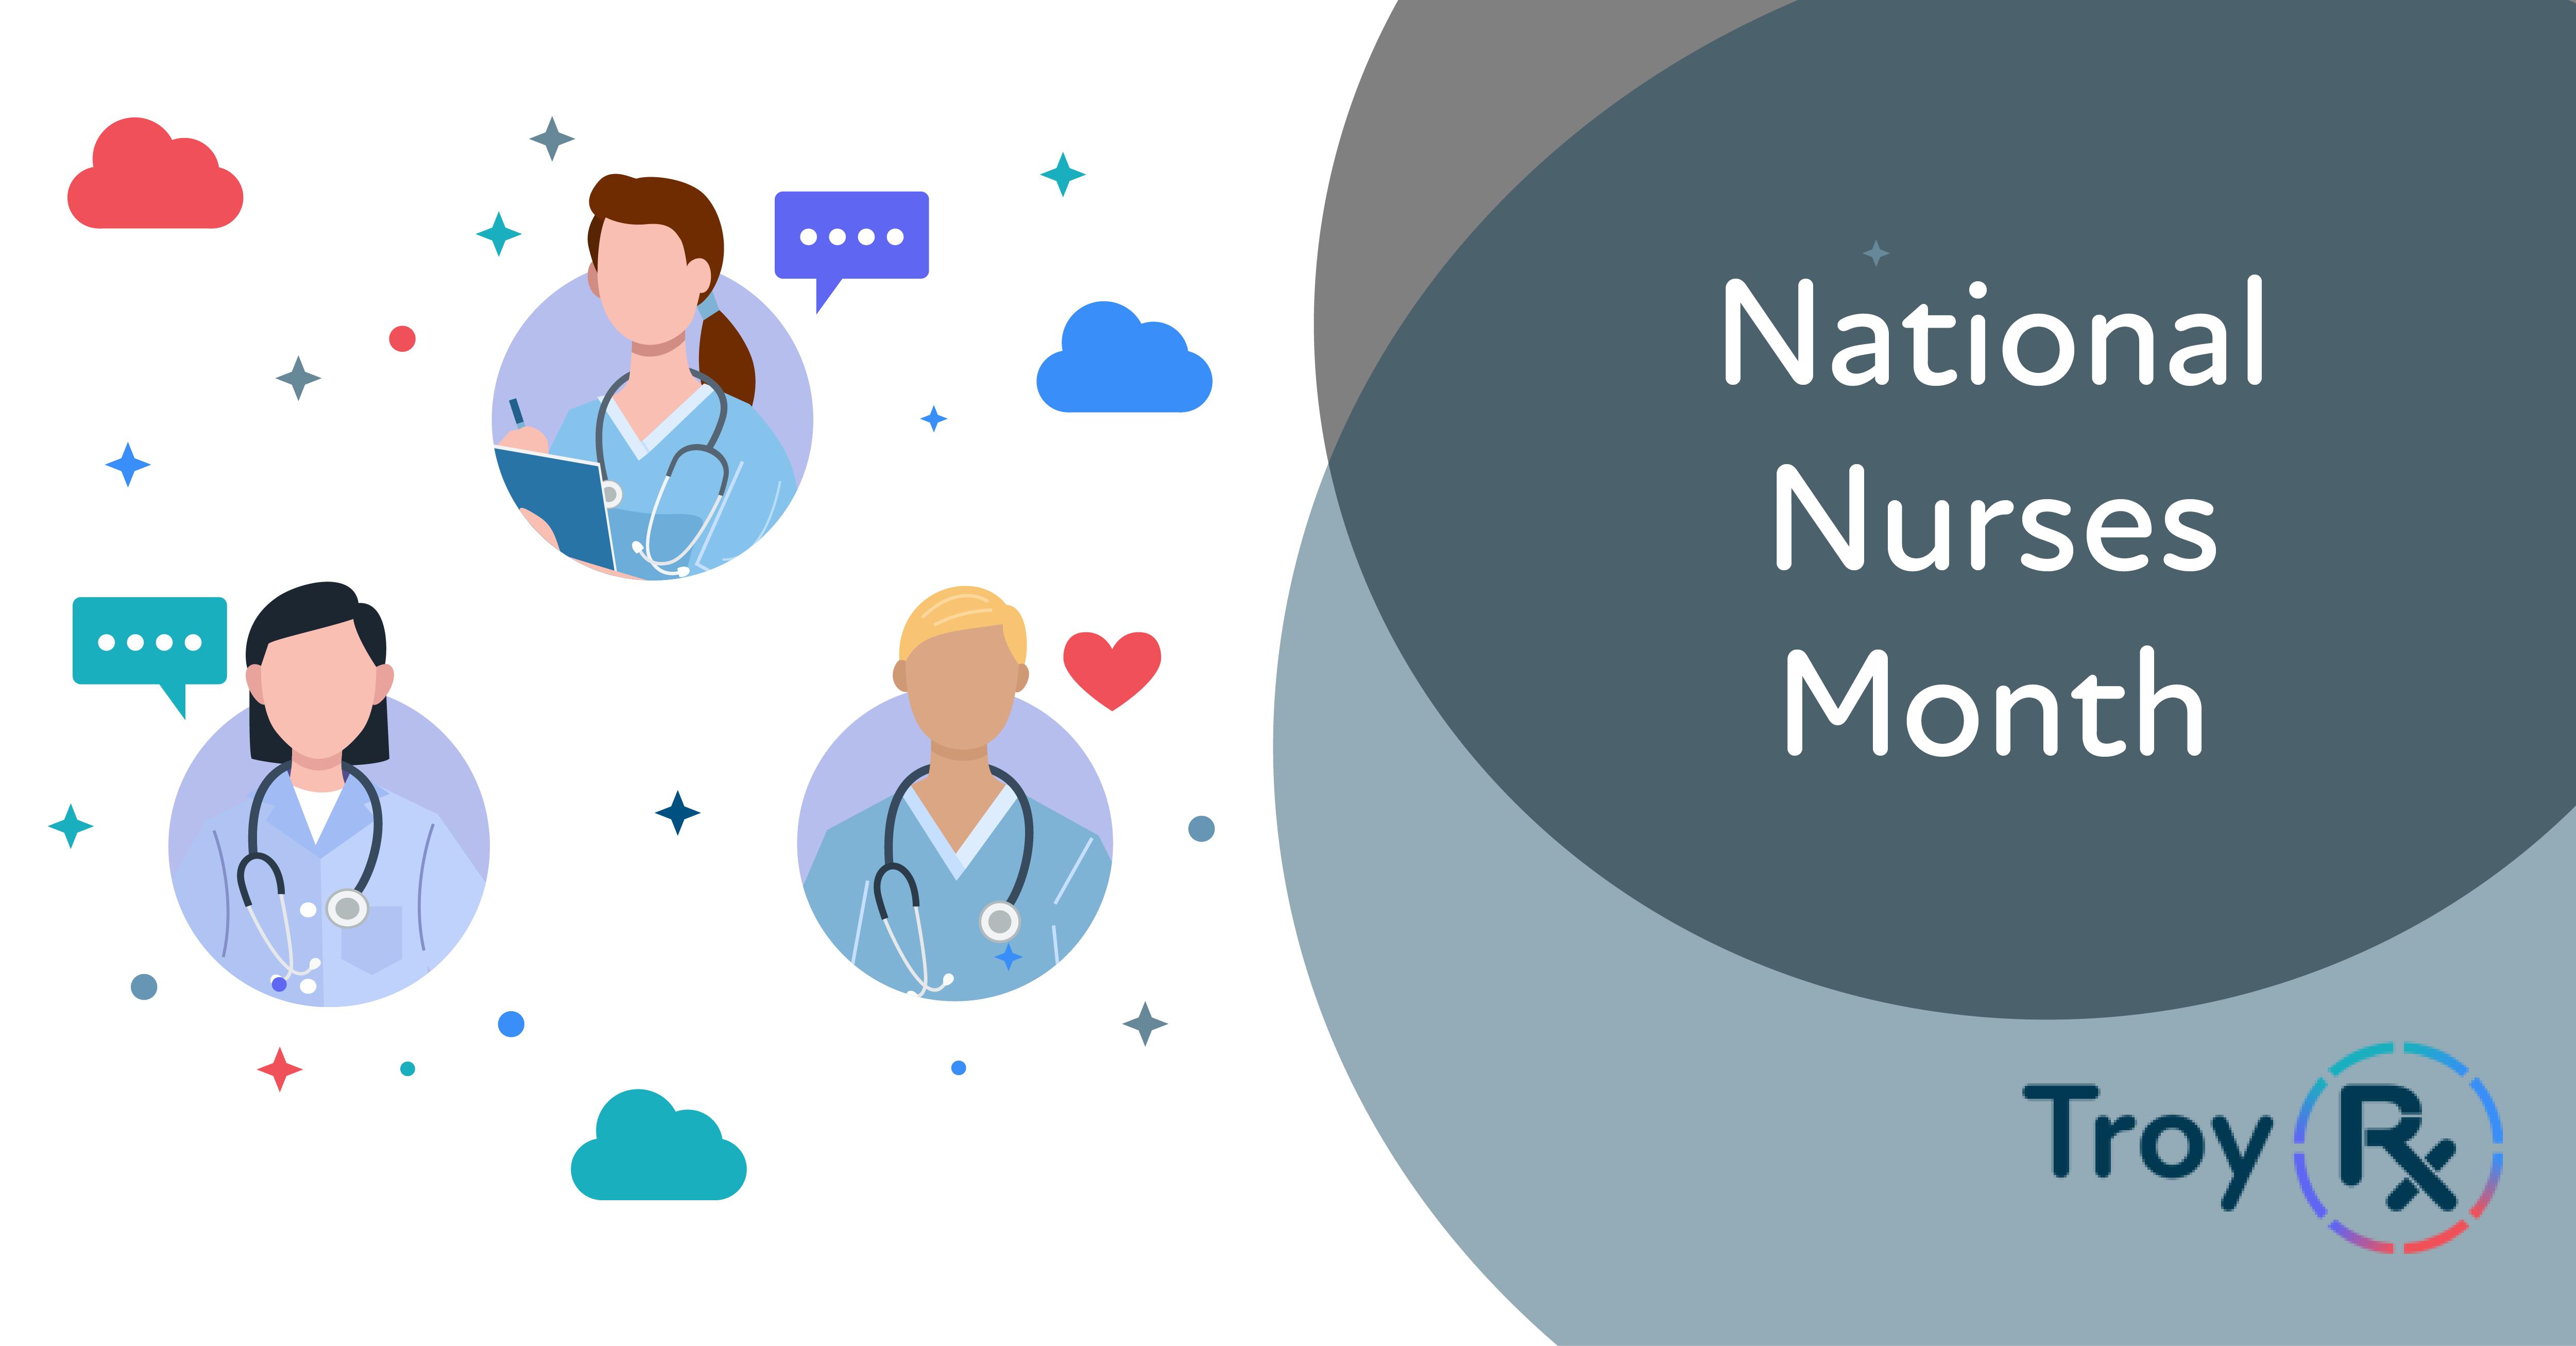 National_Nurses_Month